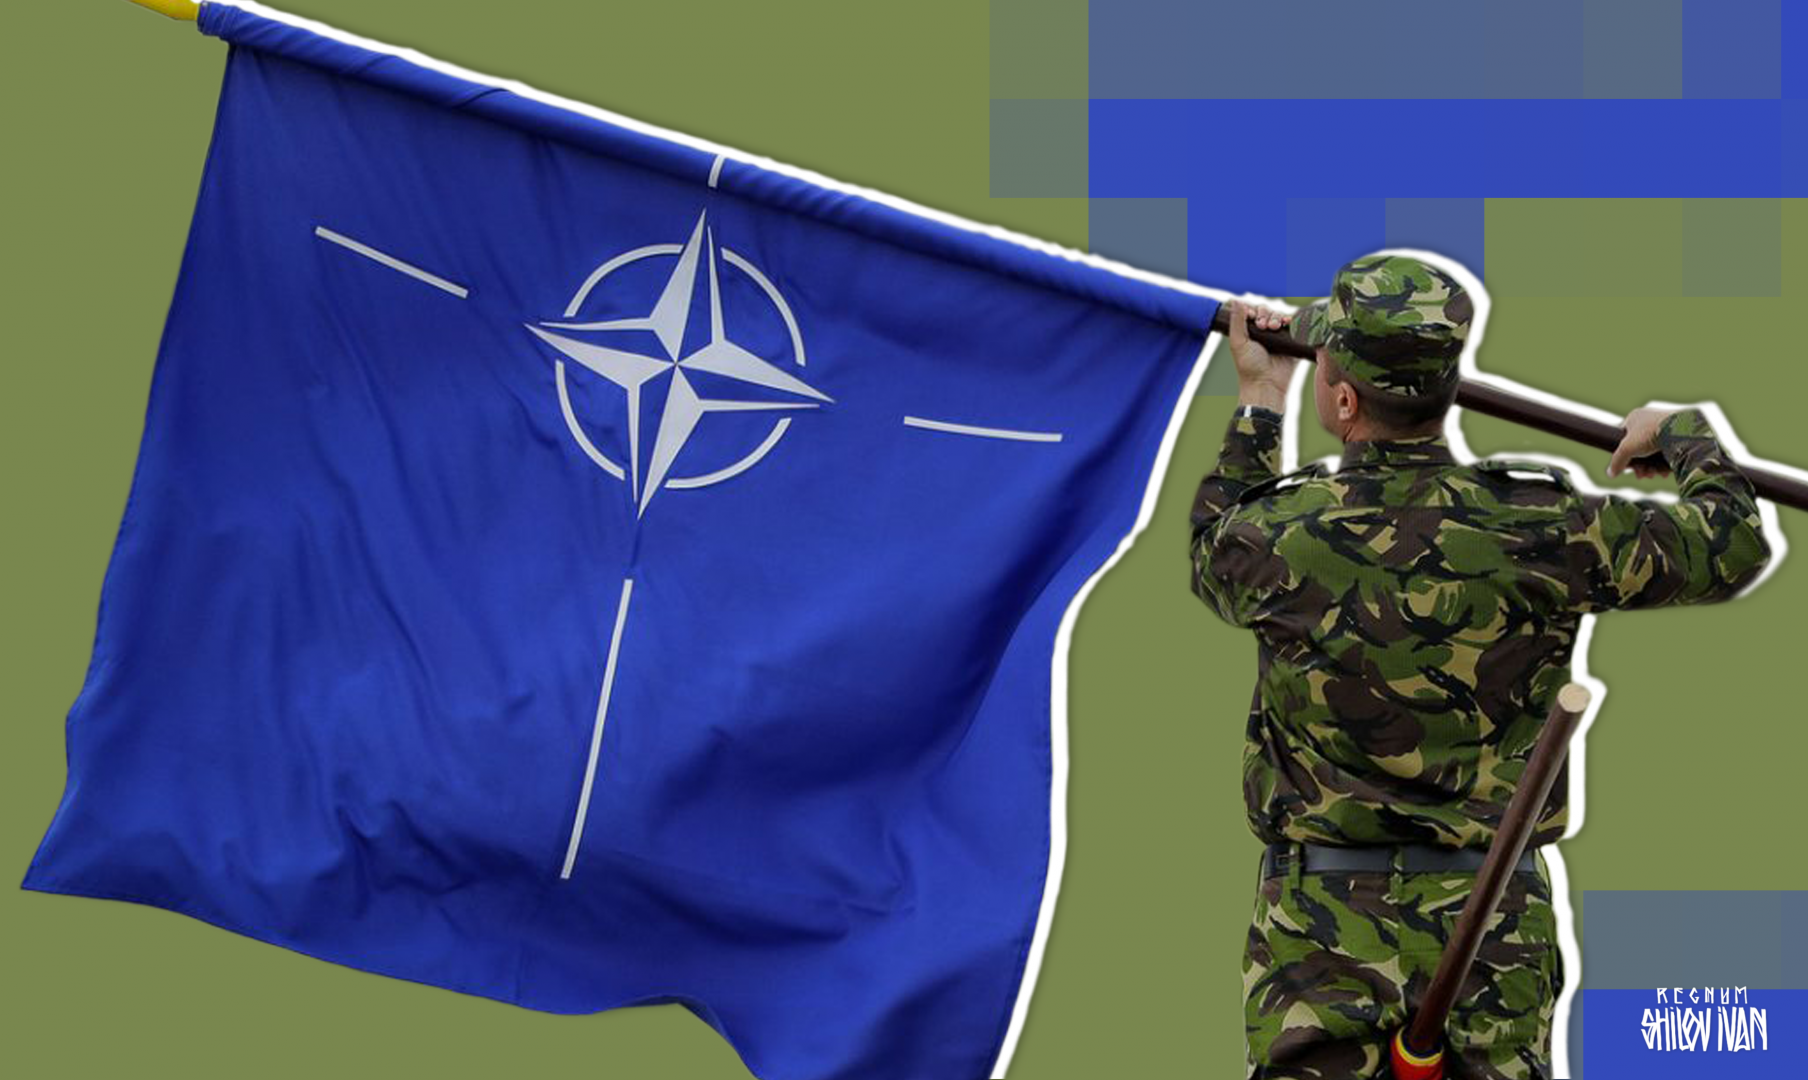 В Албании проходят учения НАТО - ИА REGNUM